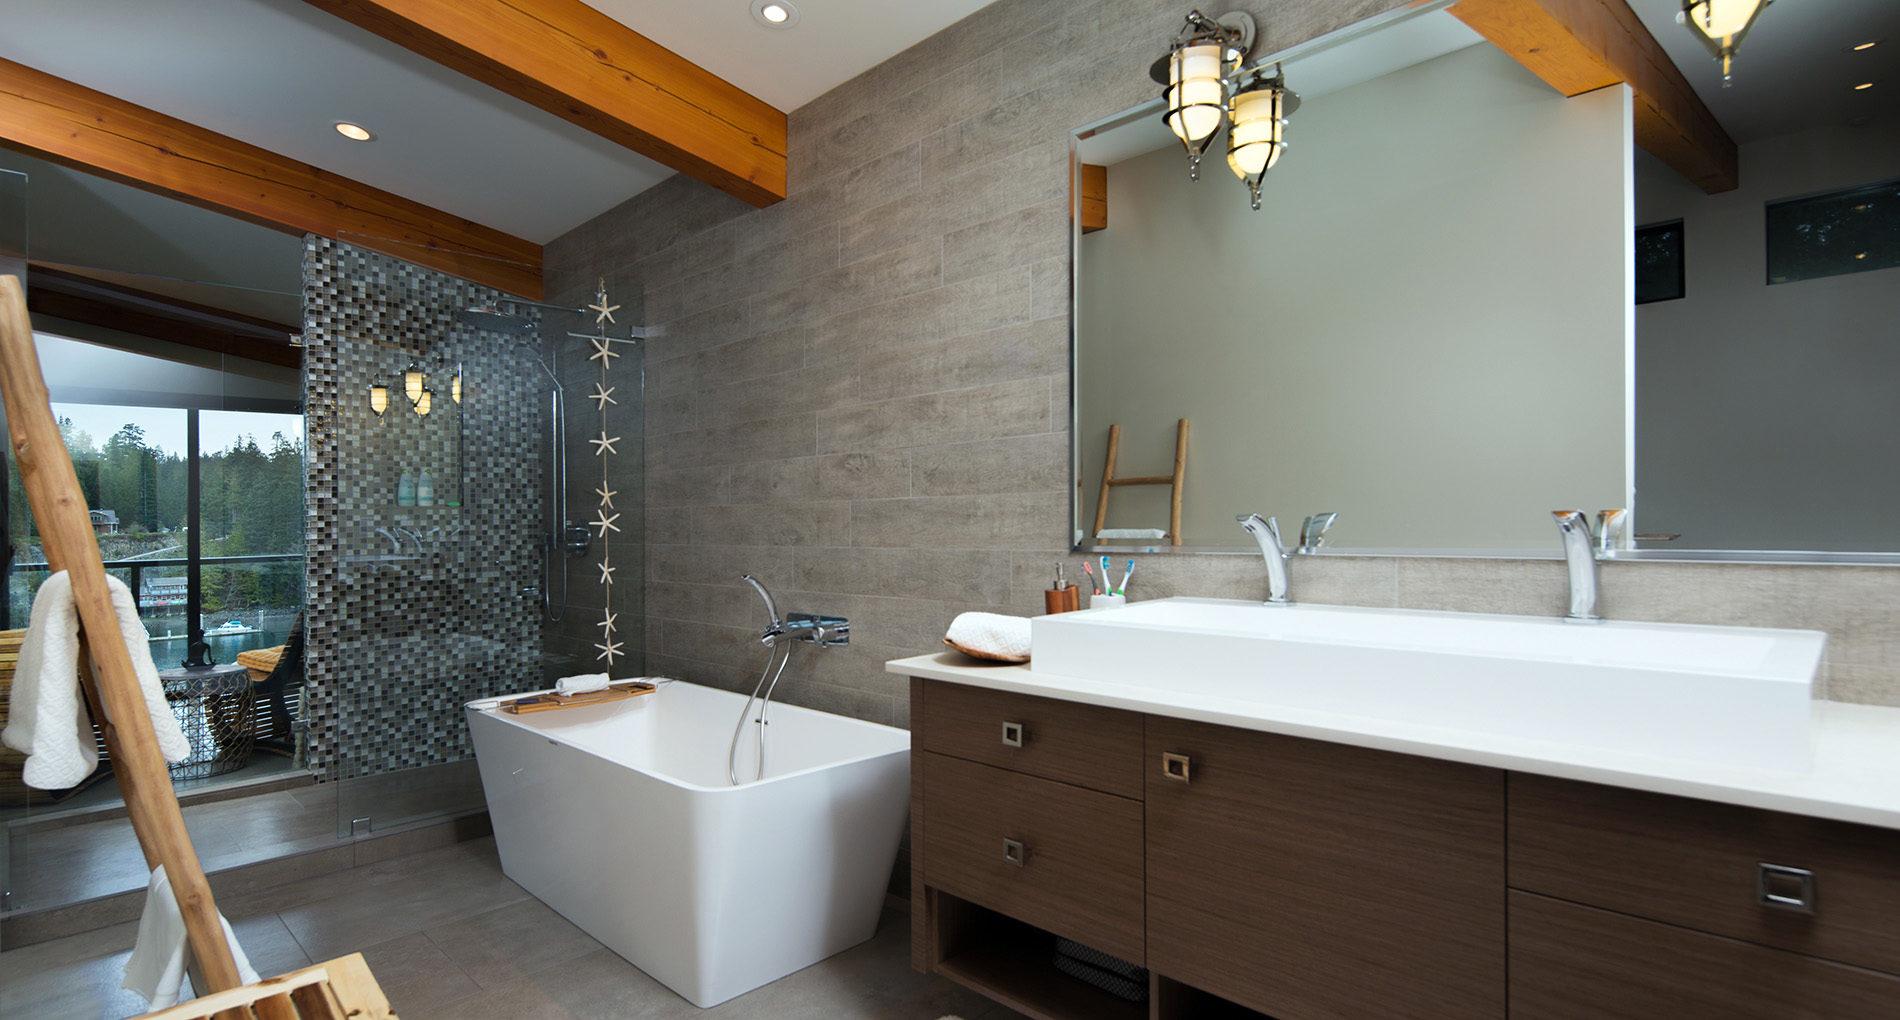 Bathroom Renovation Tricities Cliffcustom Slider